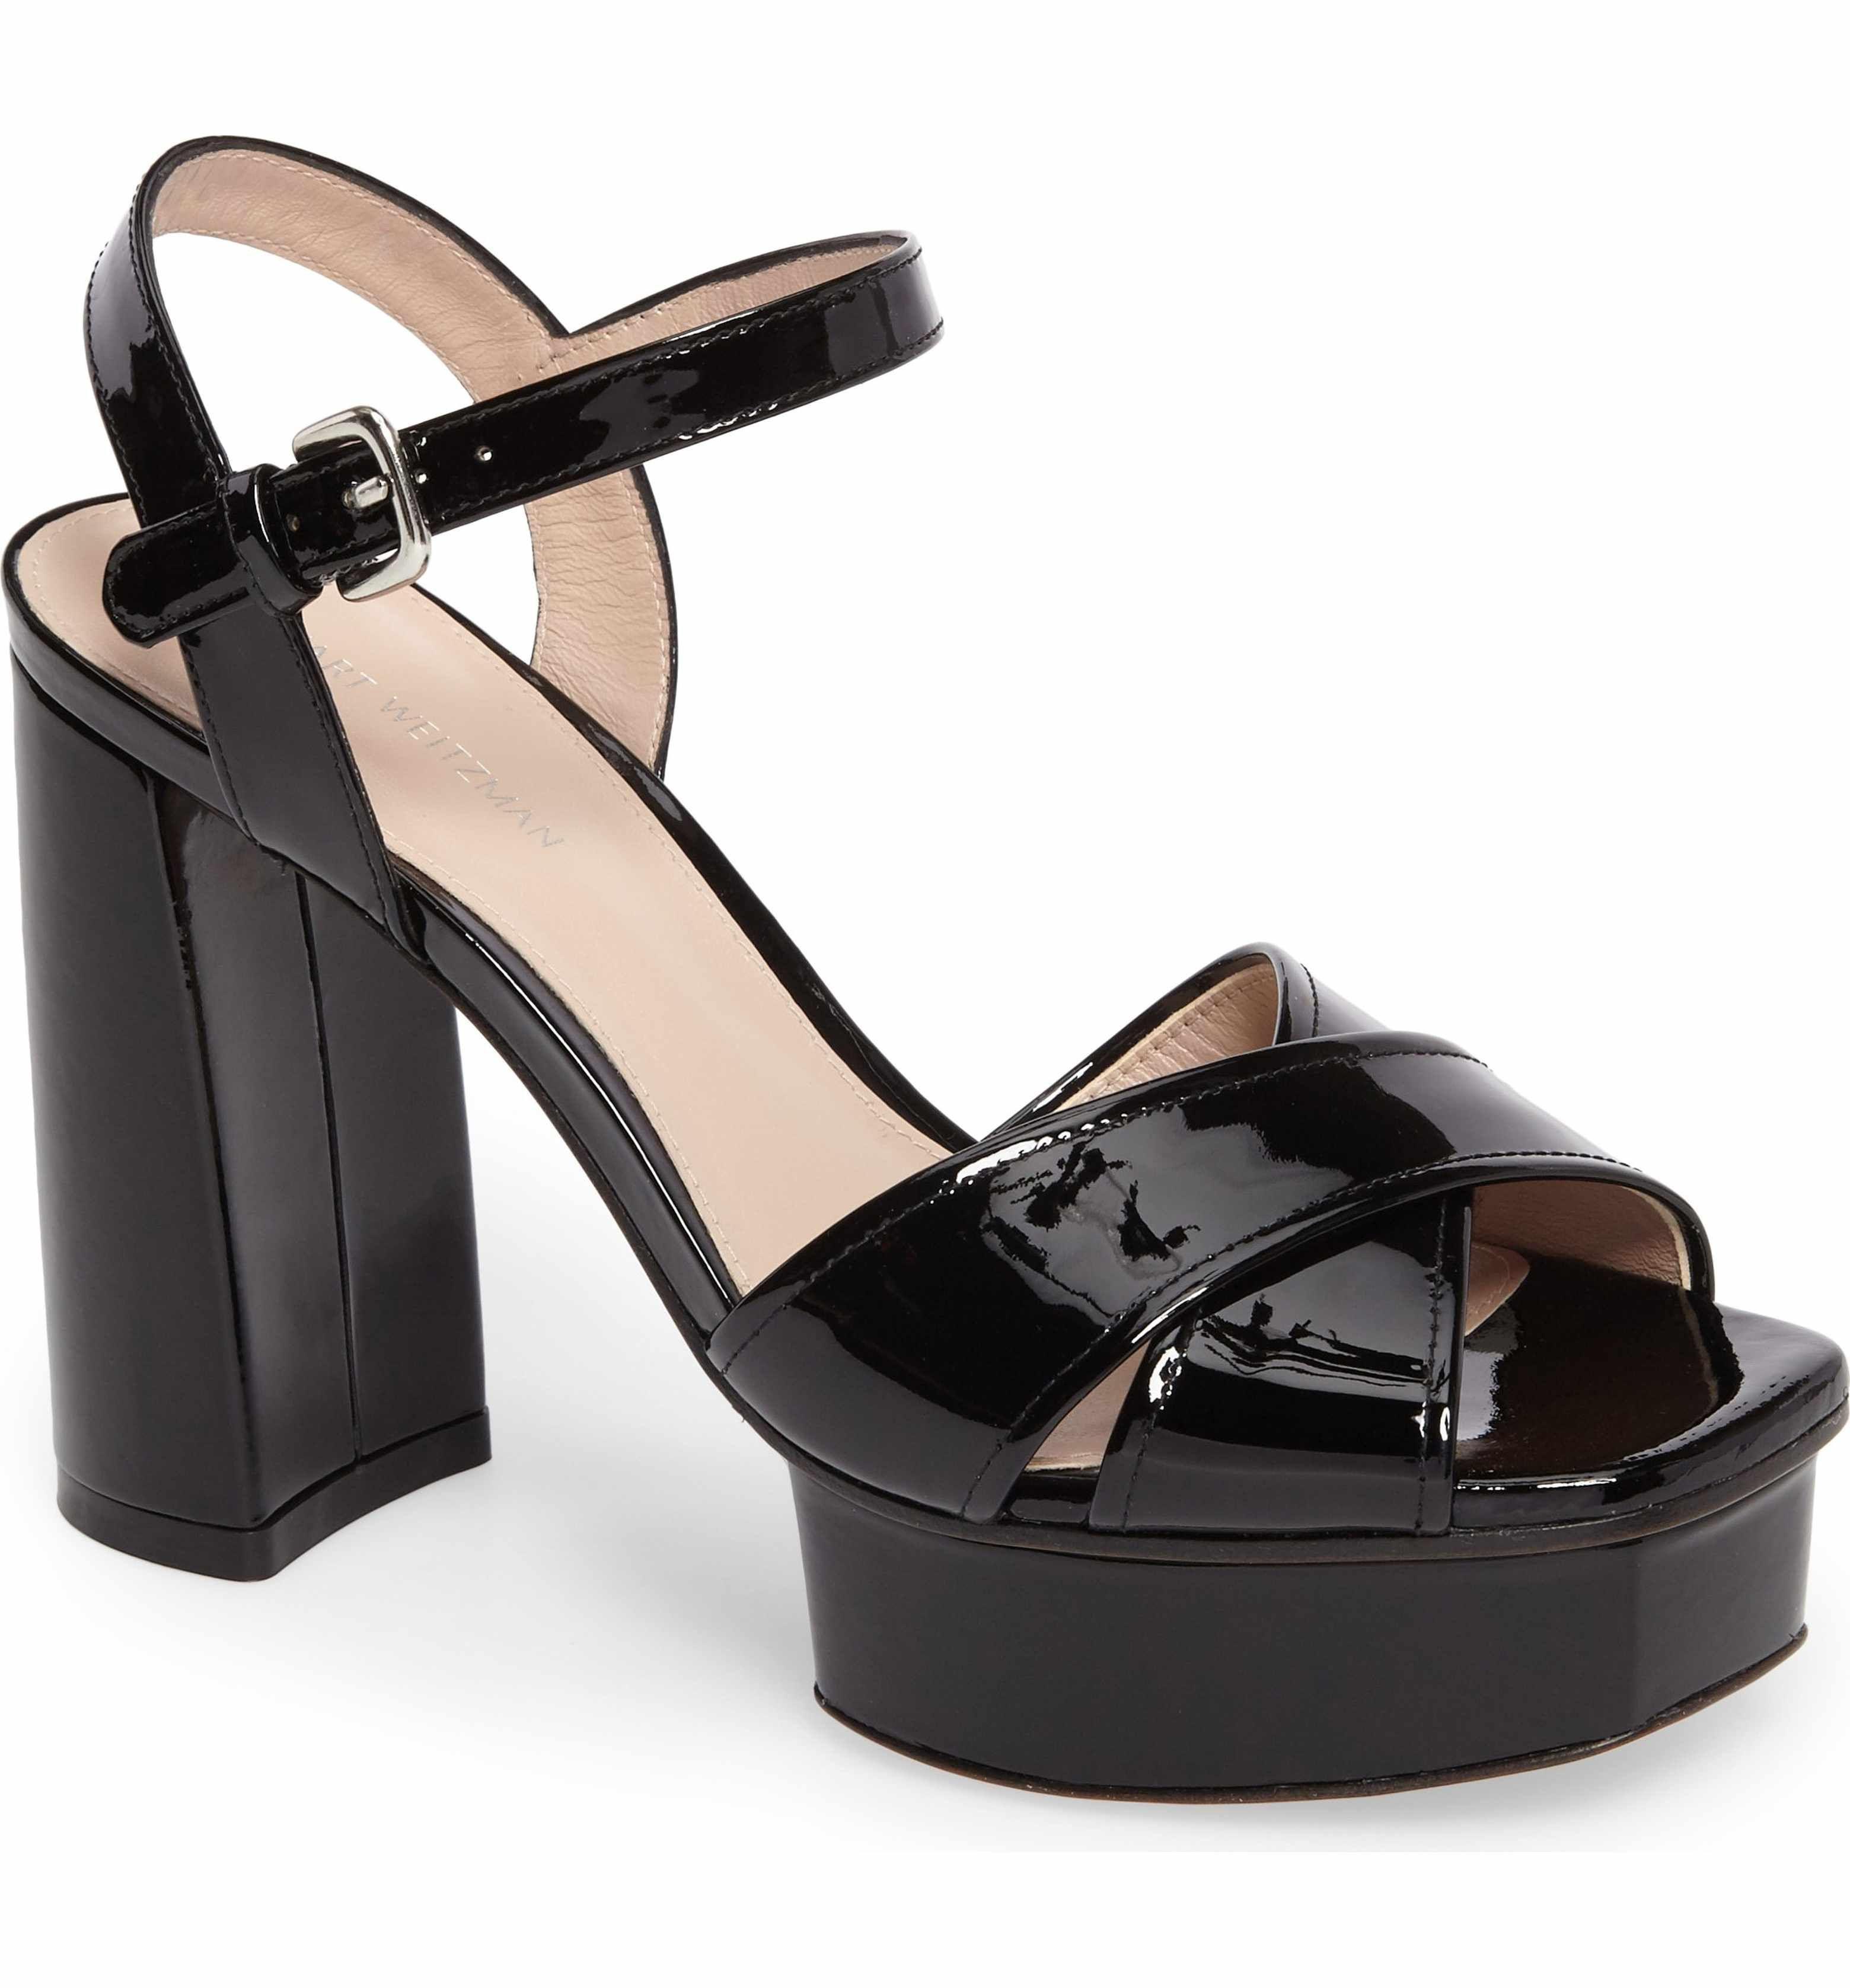 Exposed platform sandals - Blue Stuart Weitzman nwySXwf2E